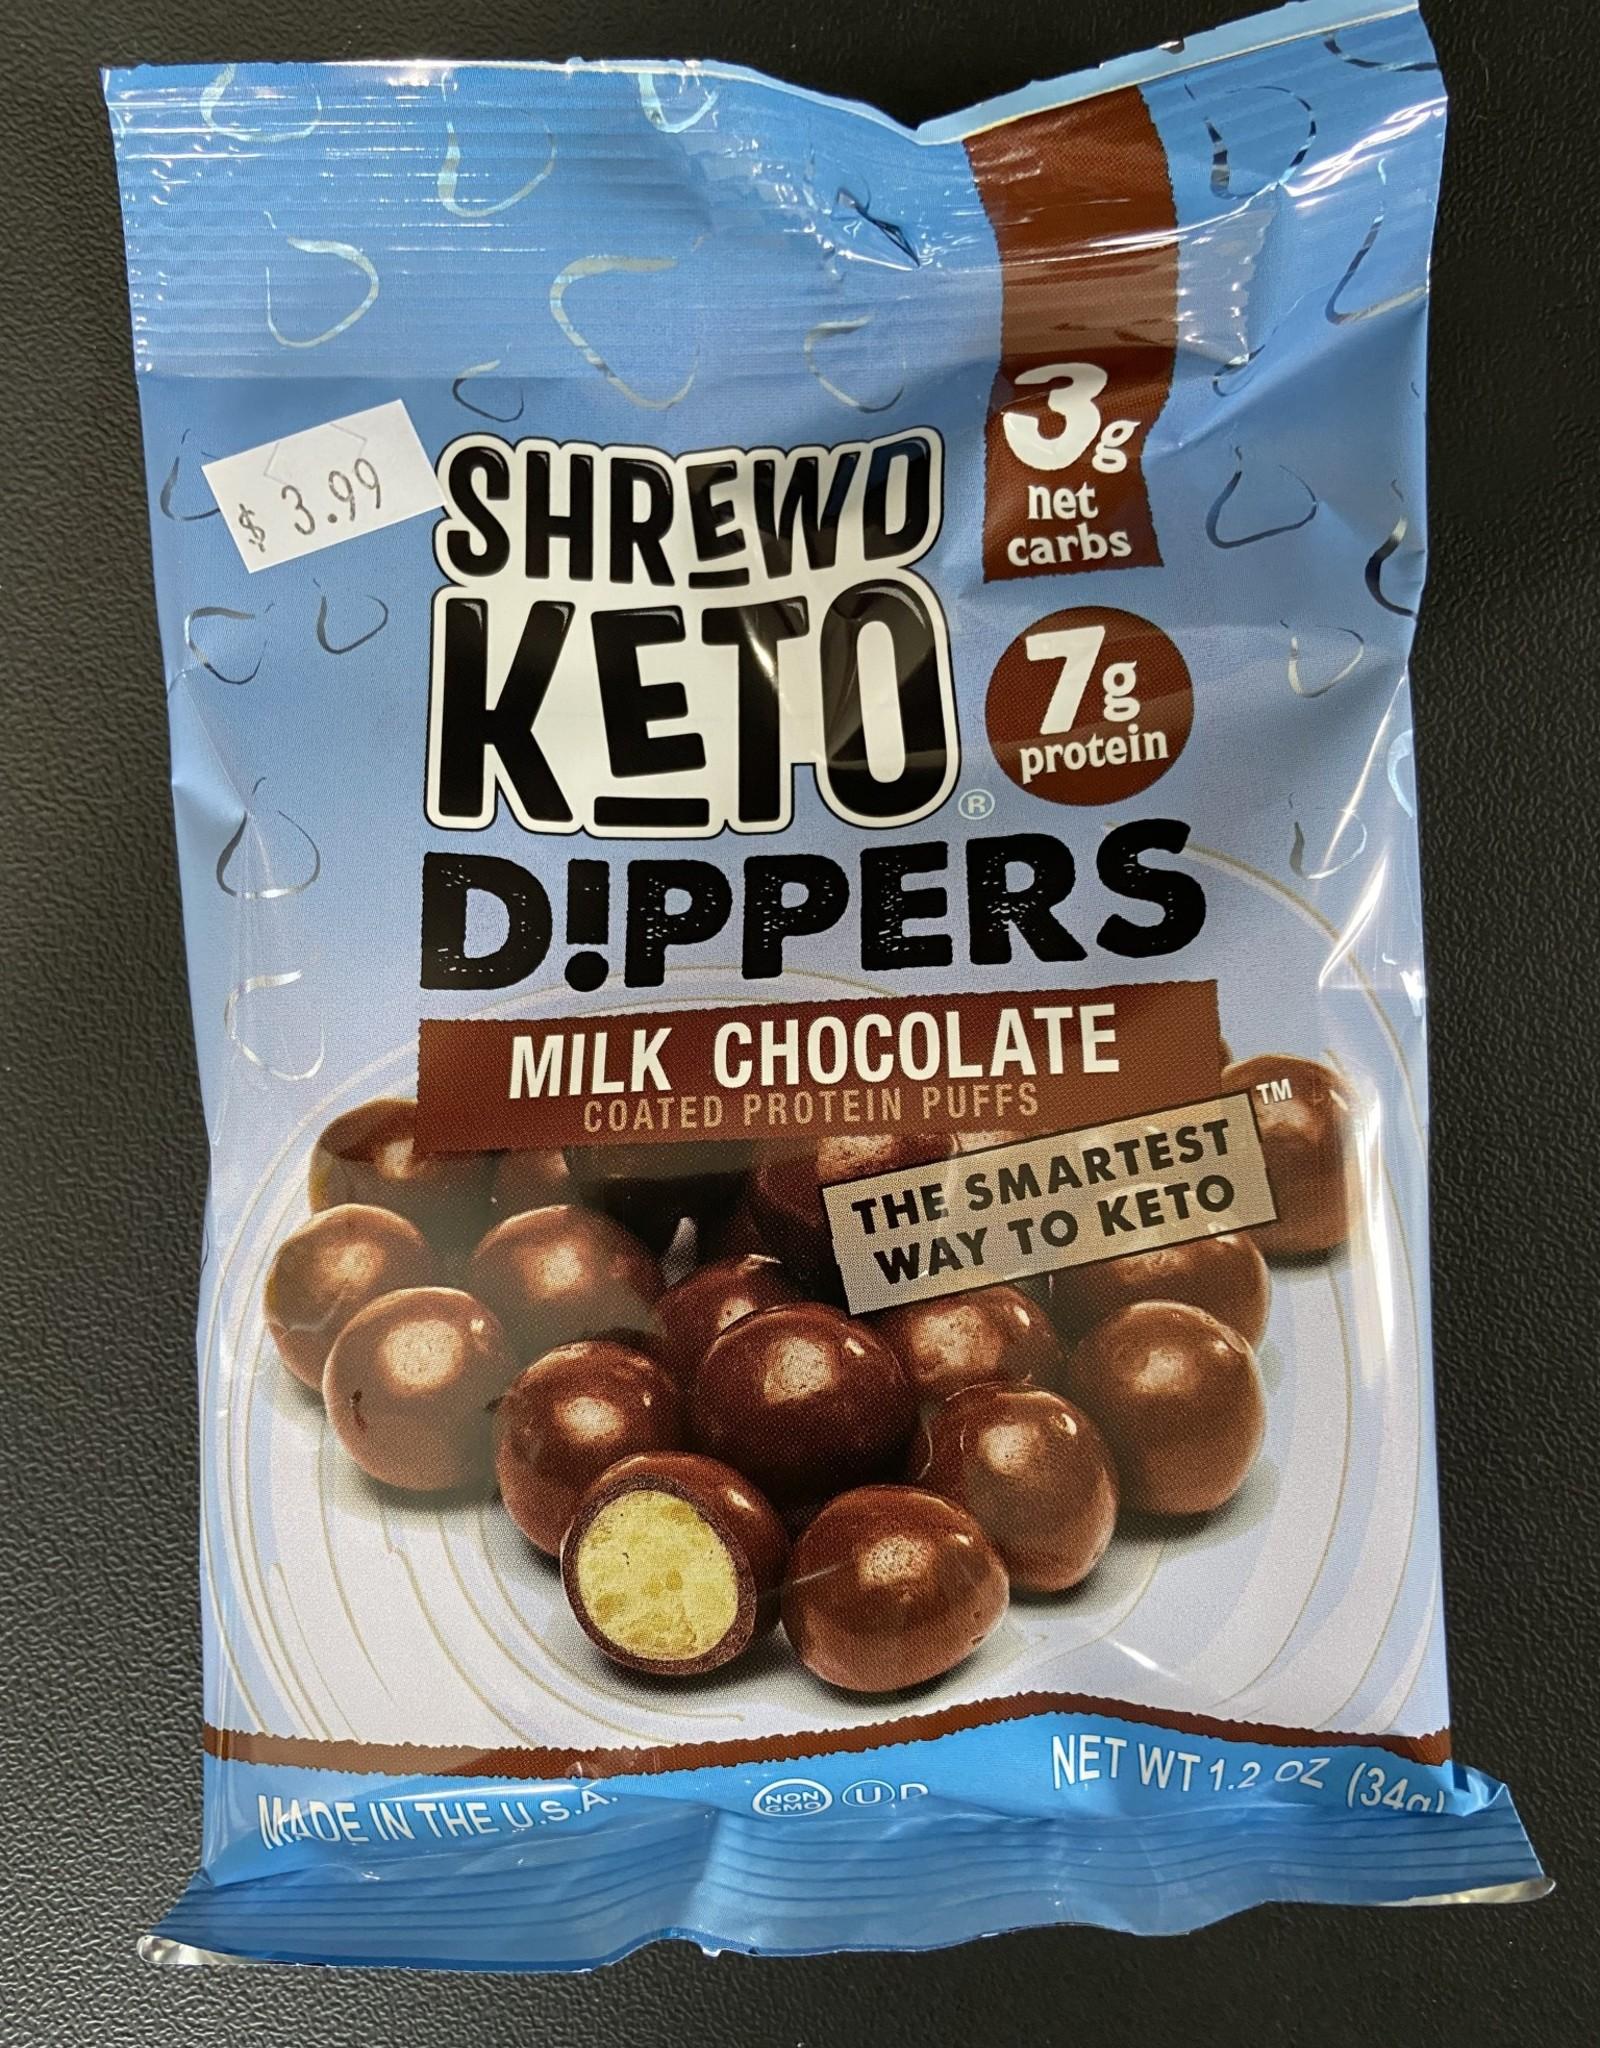 Shrewd Food Shrewd Food - Keto Dippers, Milk Chocolate, 34g